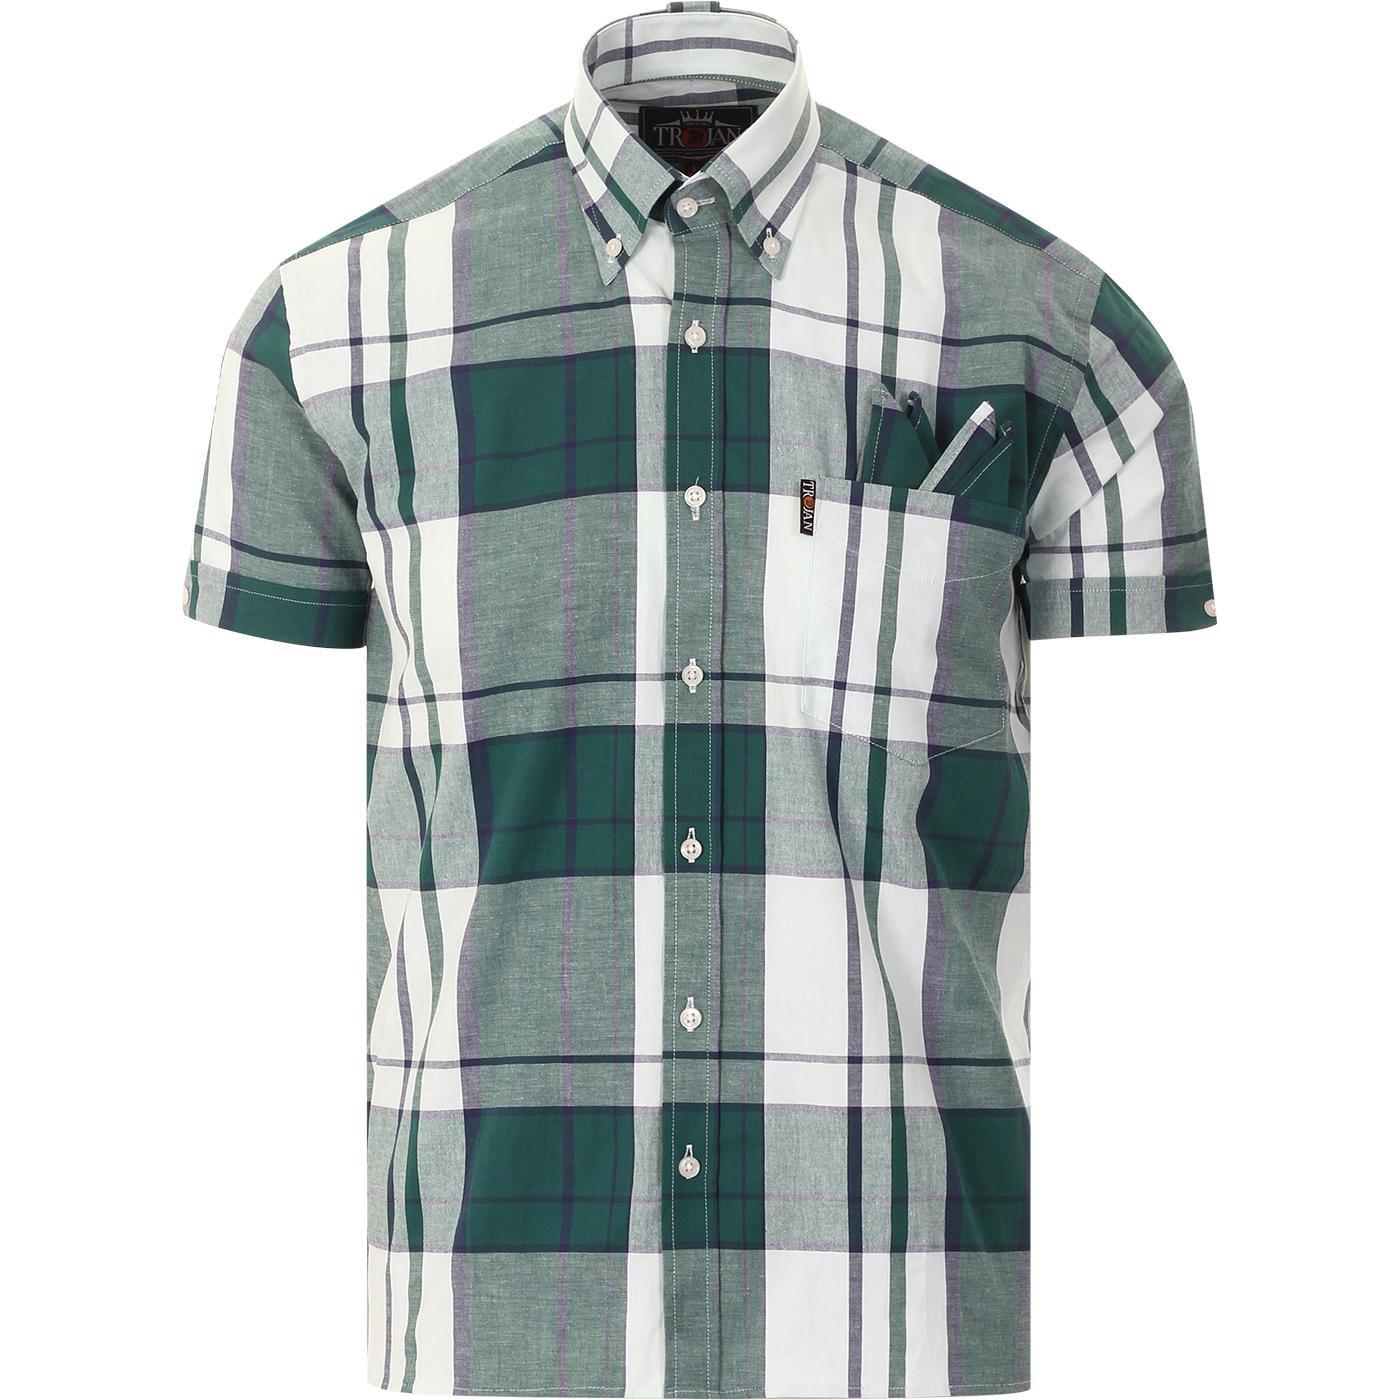 TROJAN RECORDS Mod Oversize Check BD Shirt (Green)